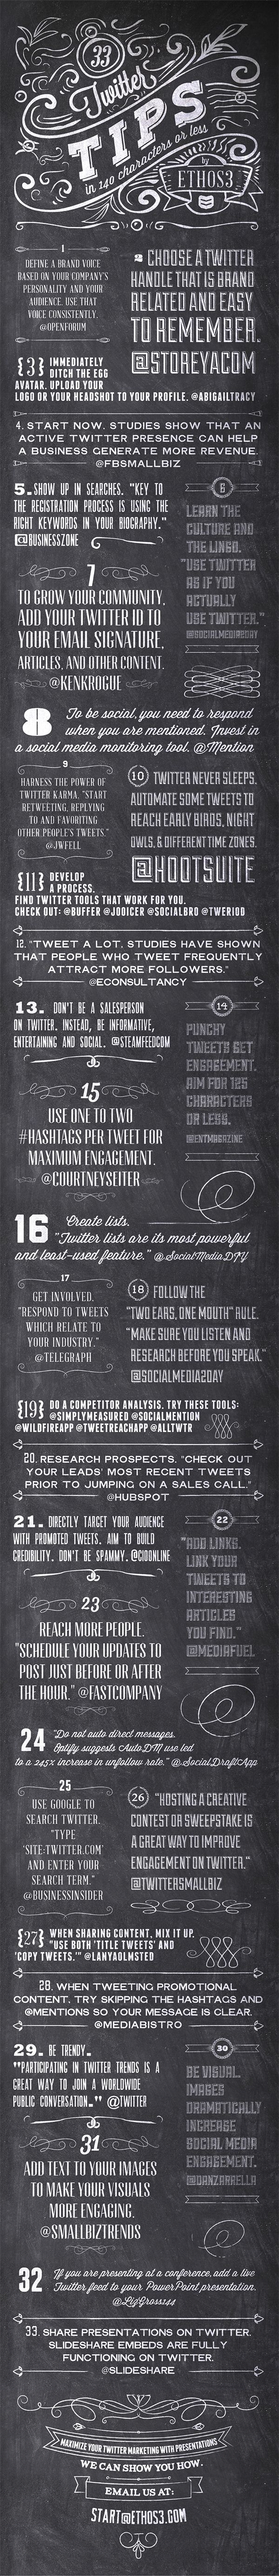 33 tips on twitter